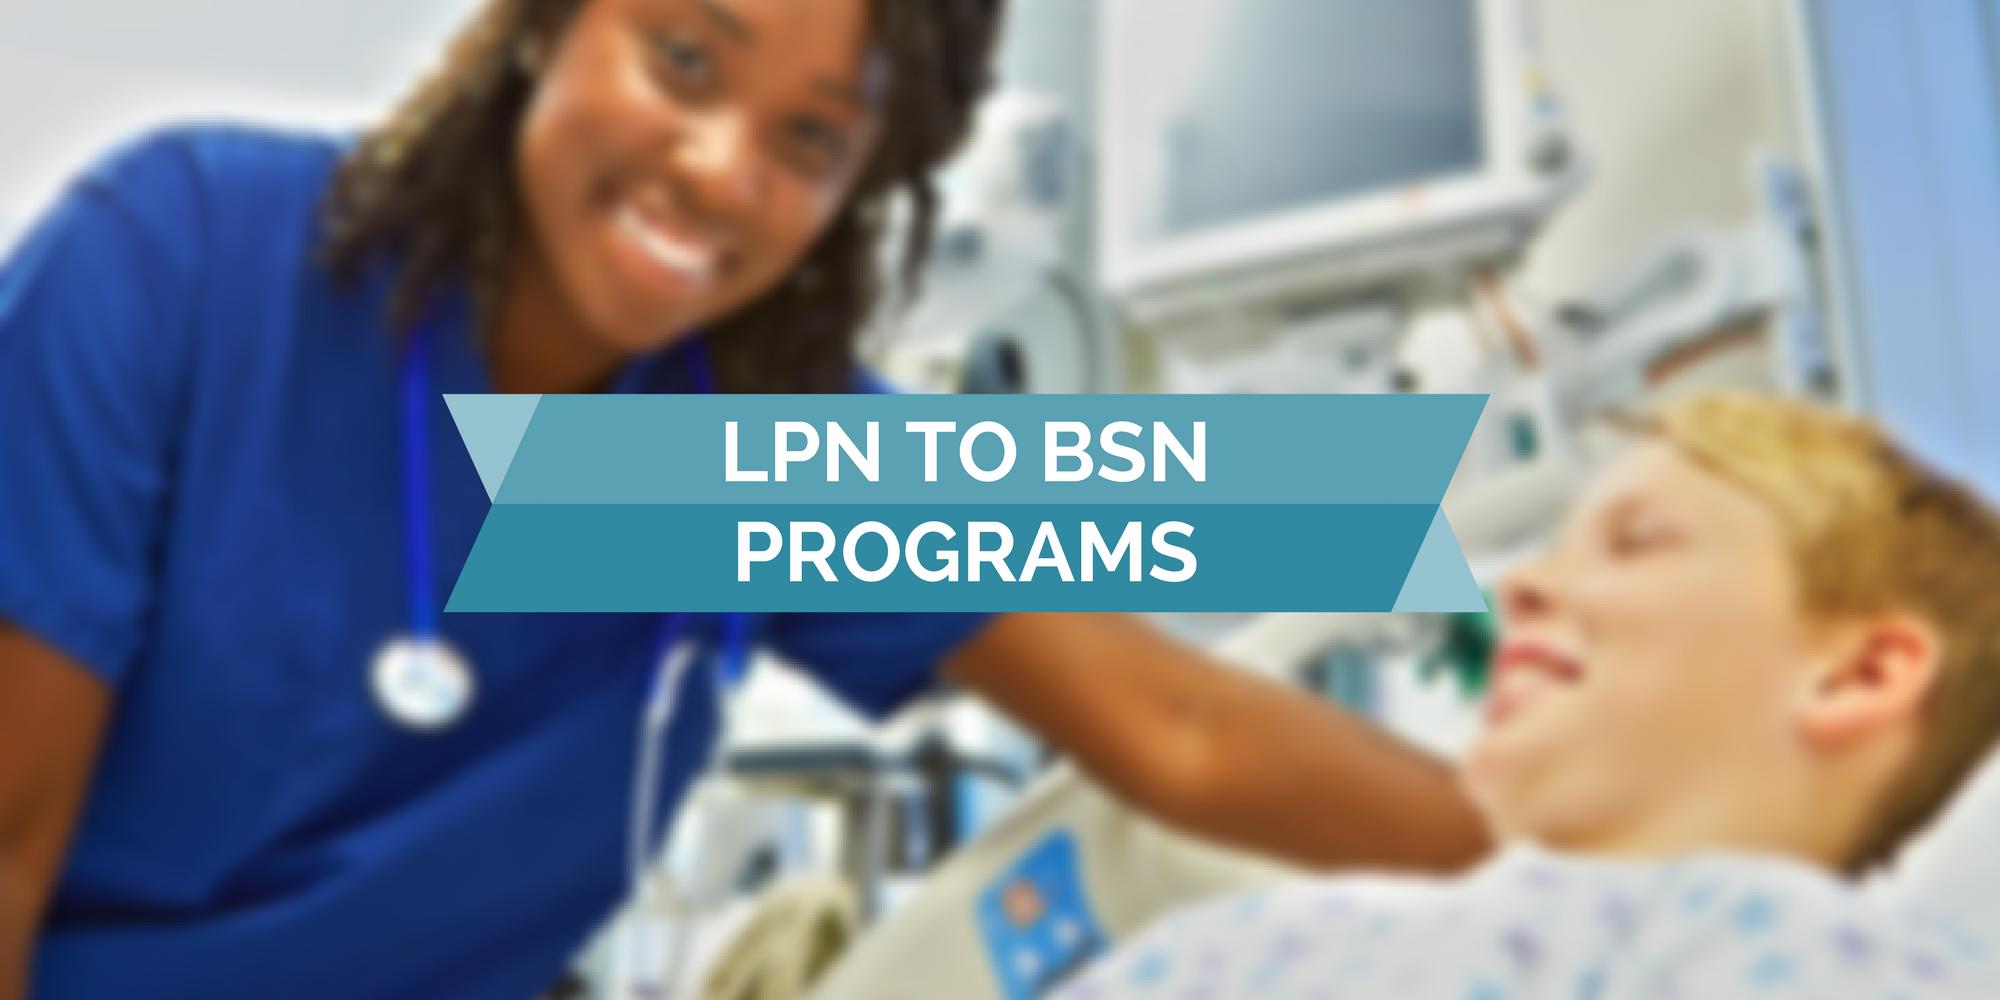 lpn to bsn programs geriatricnursing org